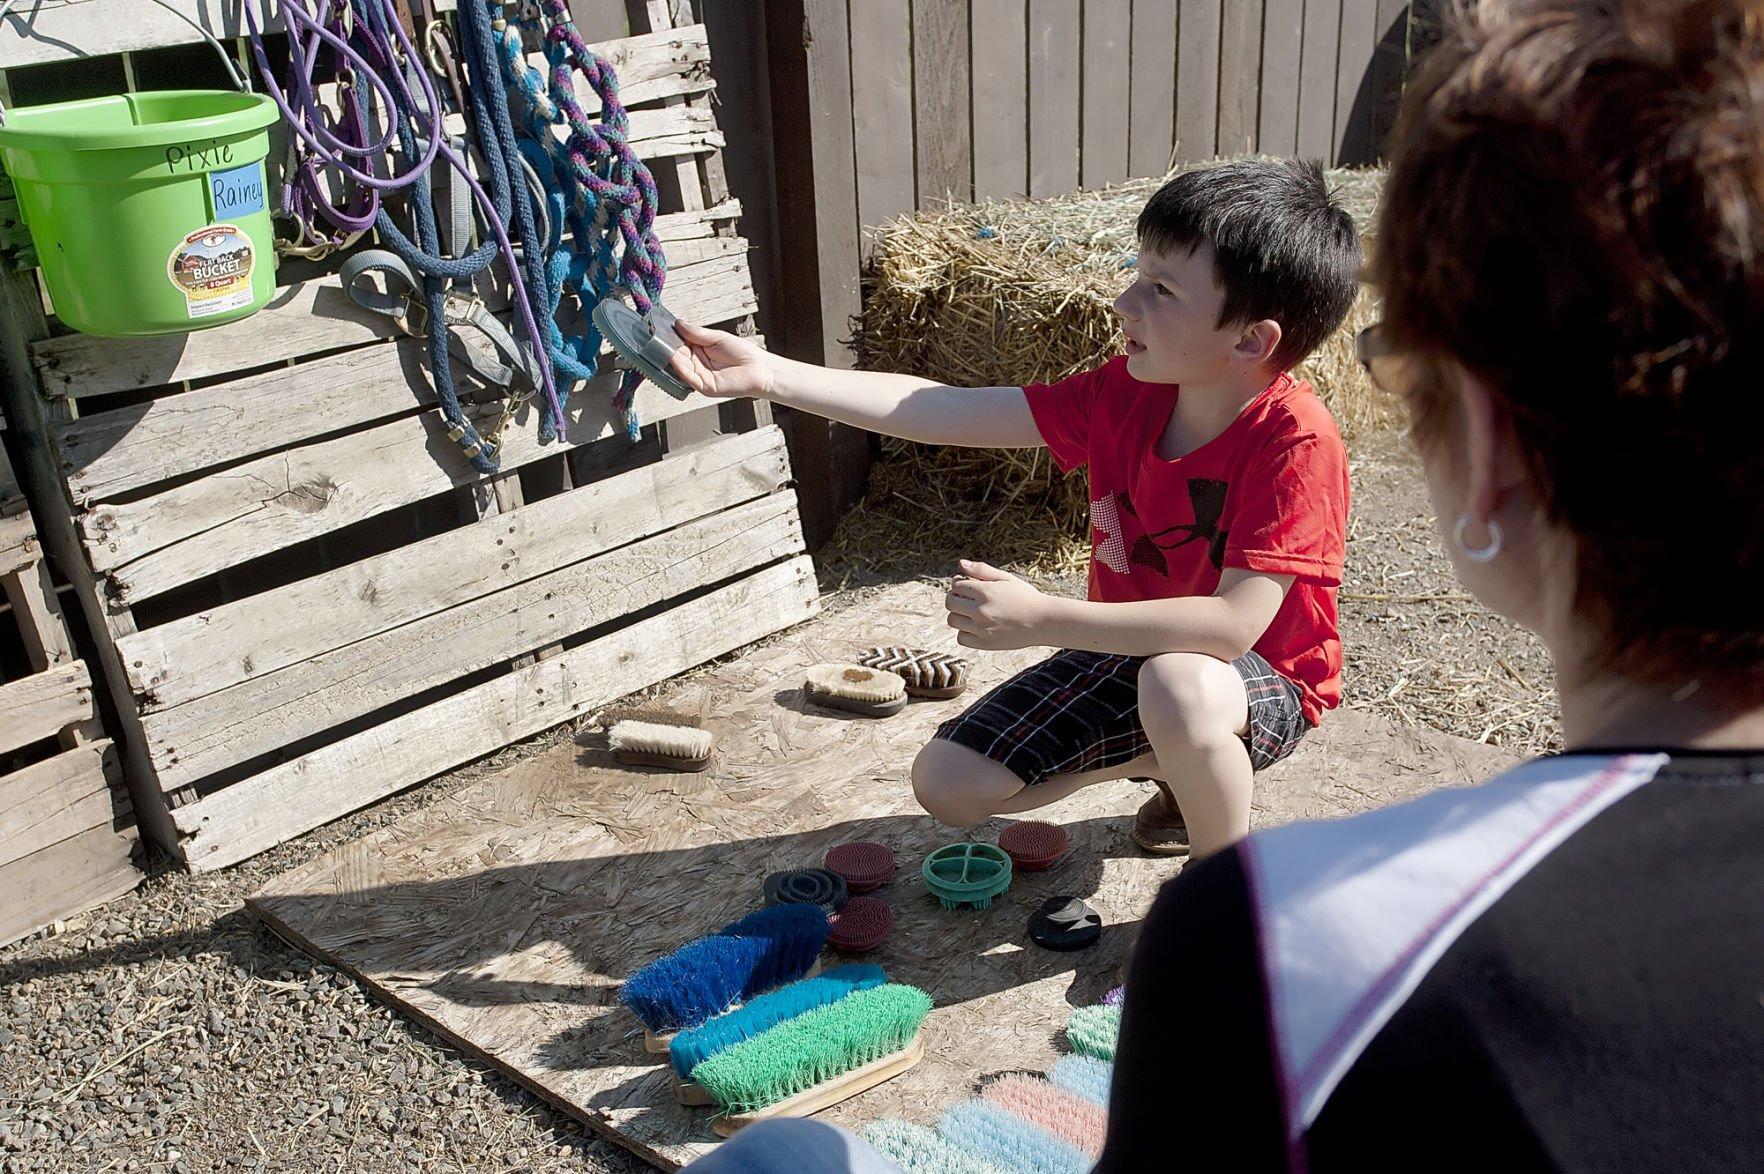 Shadow Wing Ranch teaches kids life skills